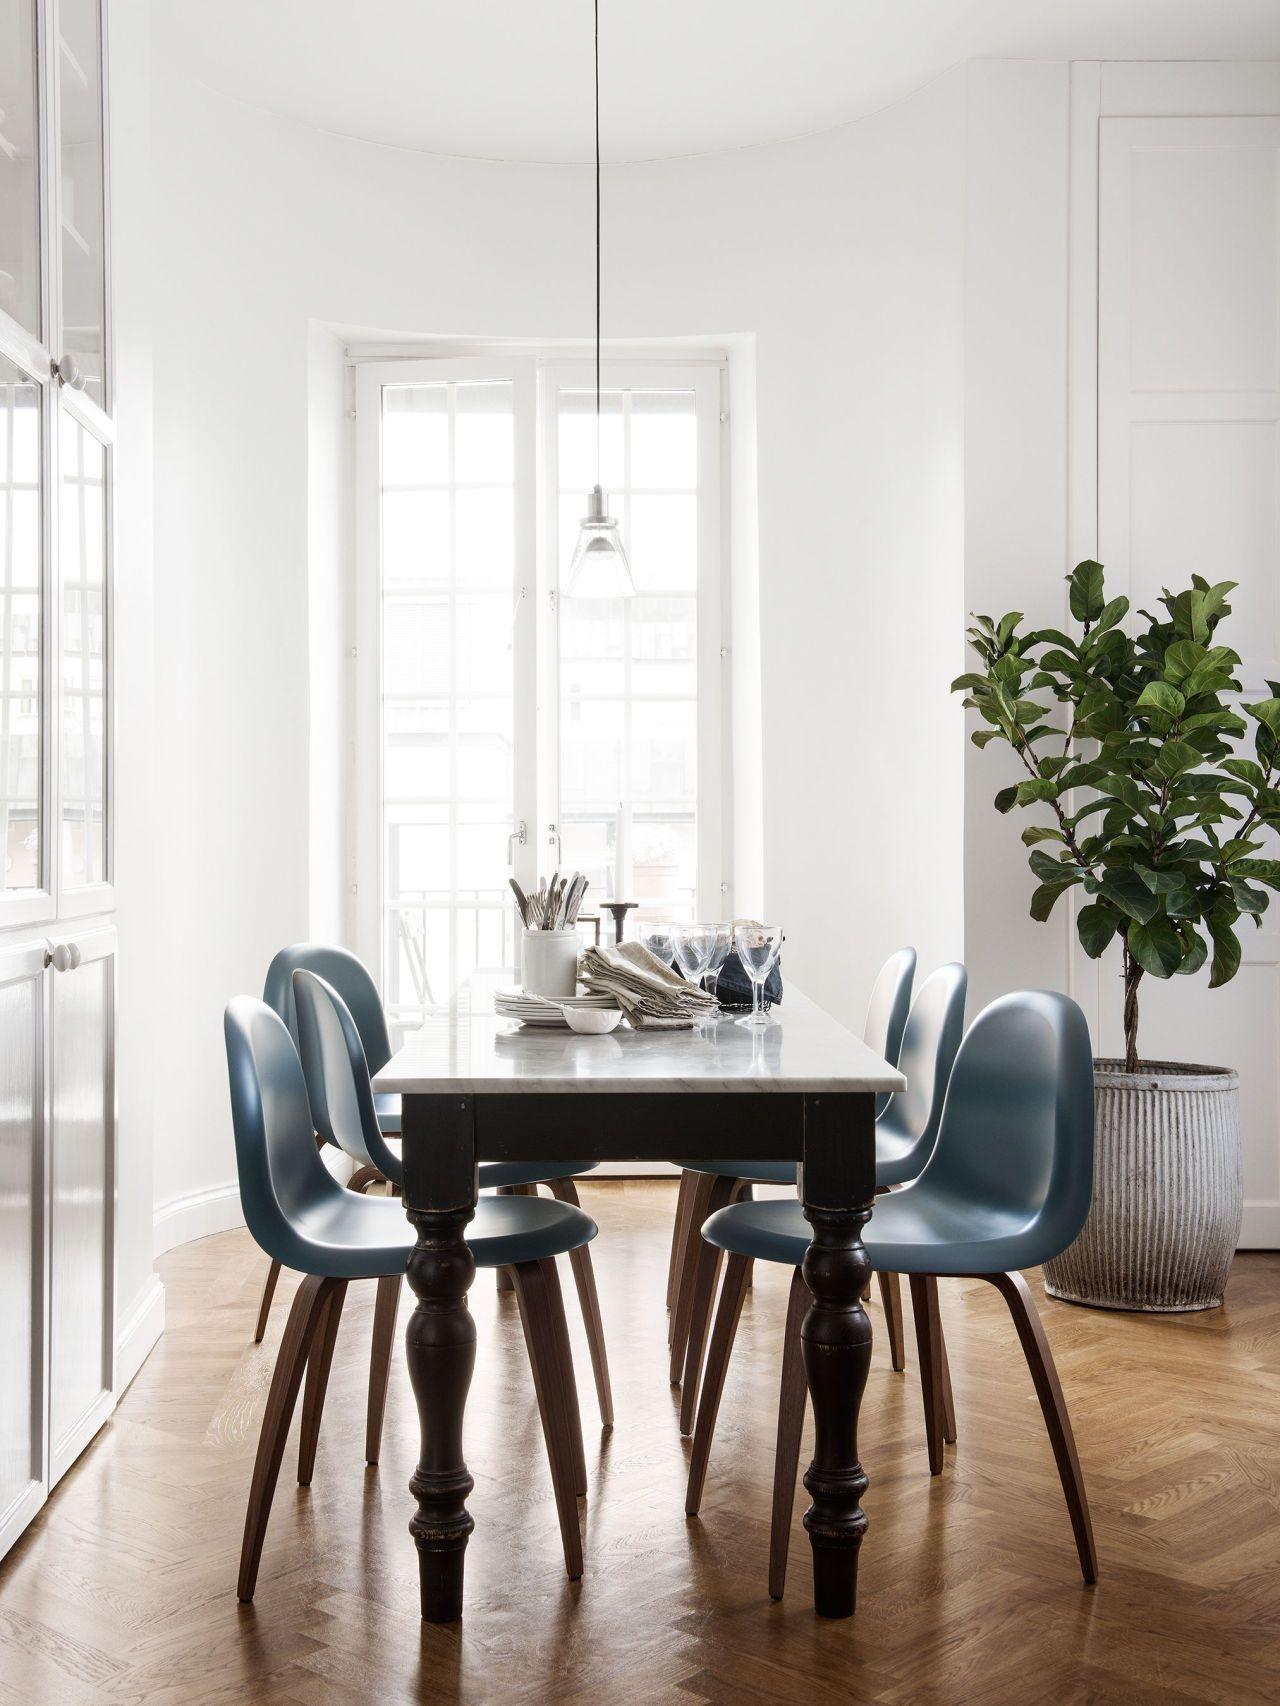 Captivating Dining Room Tables Design Ideas35